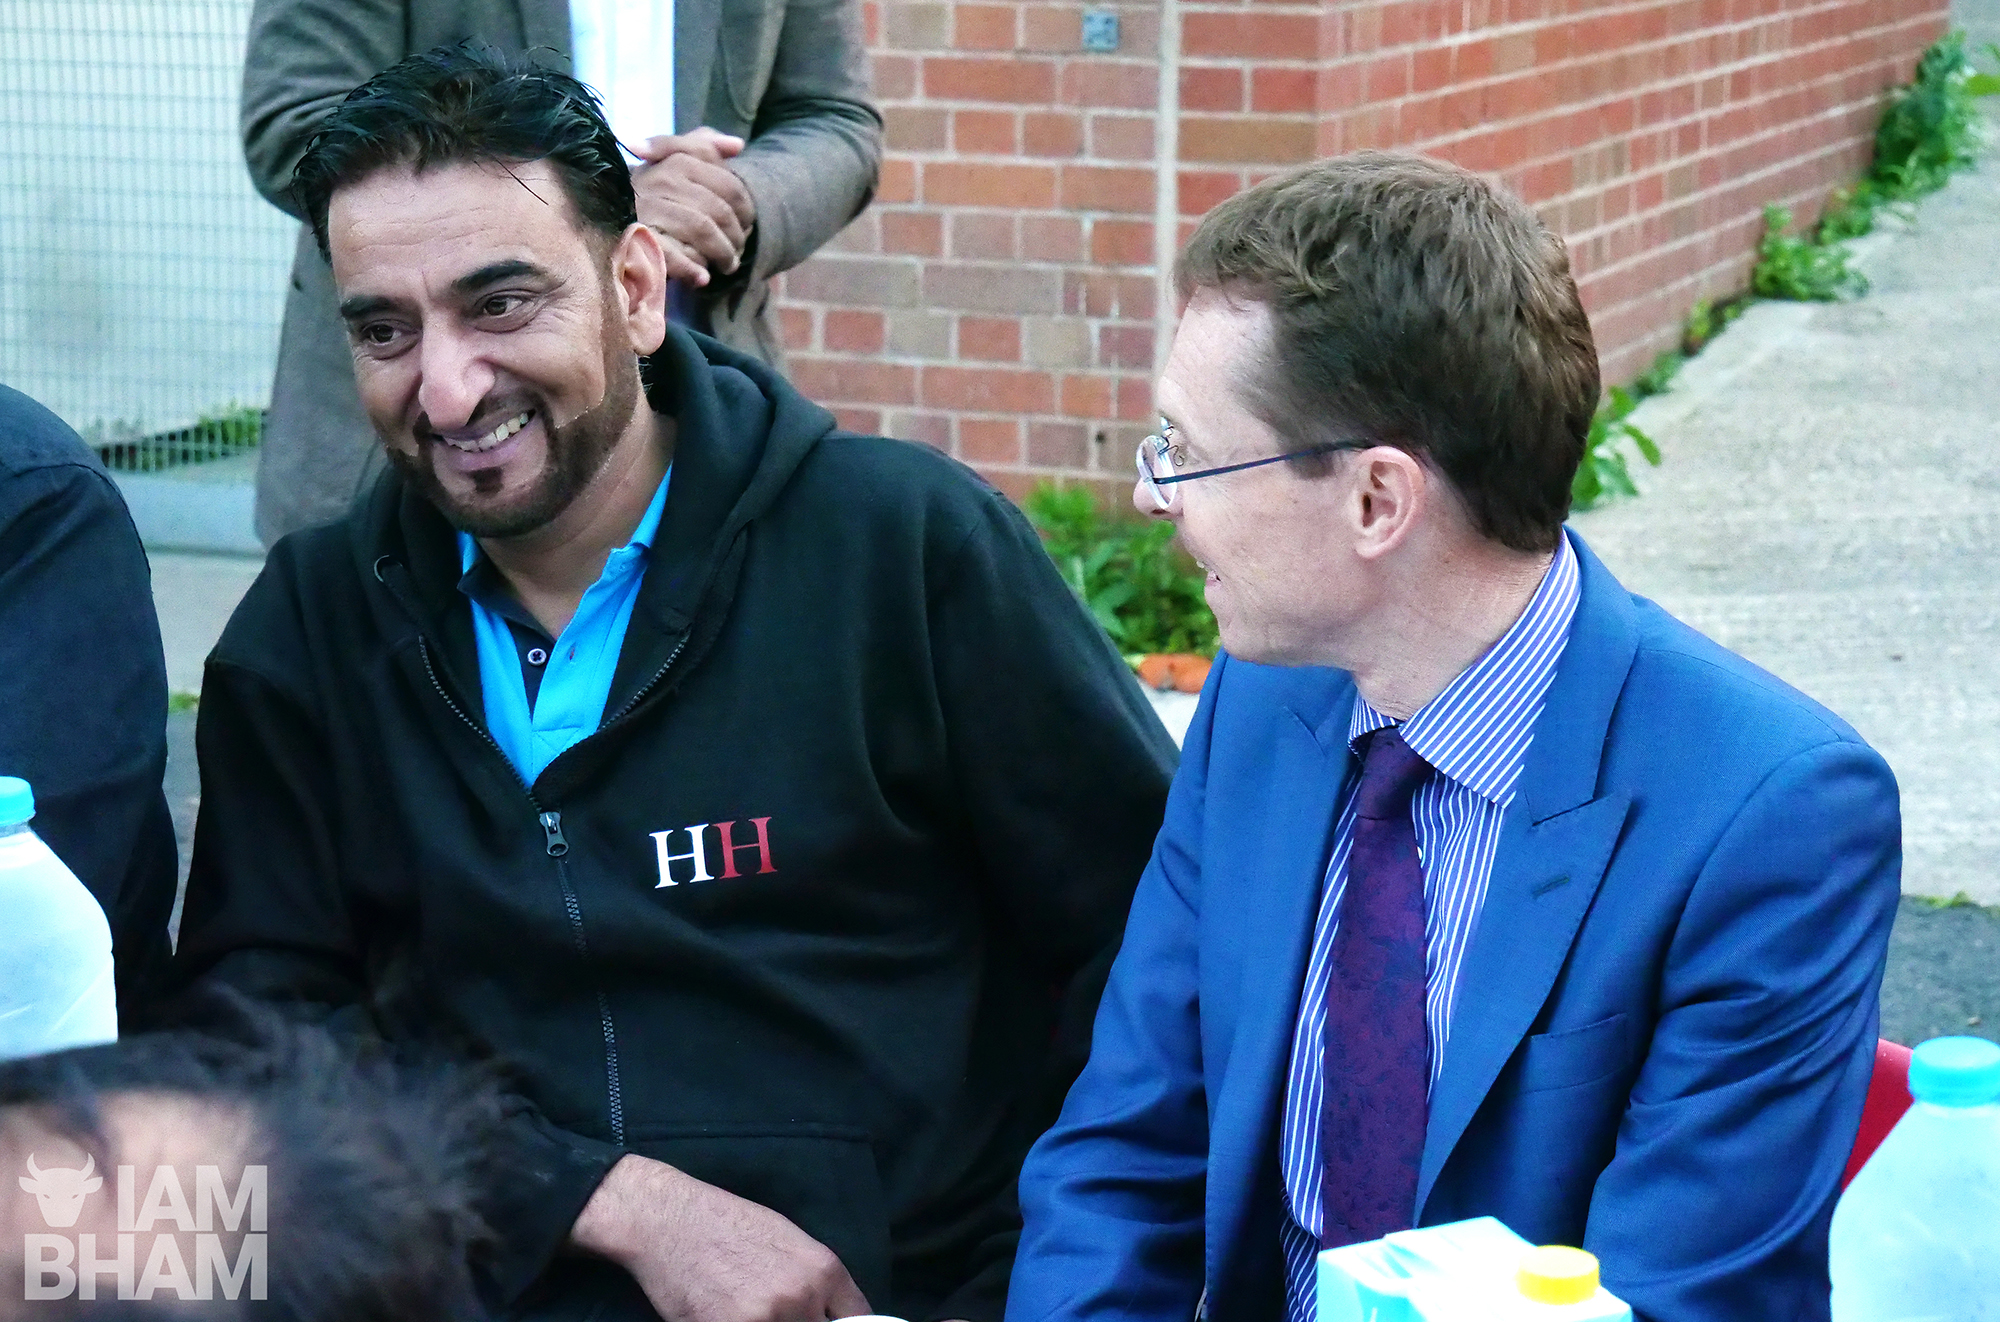 Homeless Heroes founder Javed Iqbal (left) with West Midlands Metro Mayor Andy Street